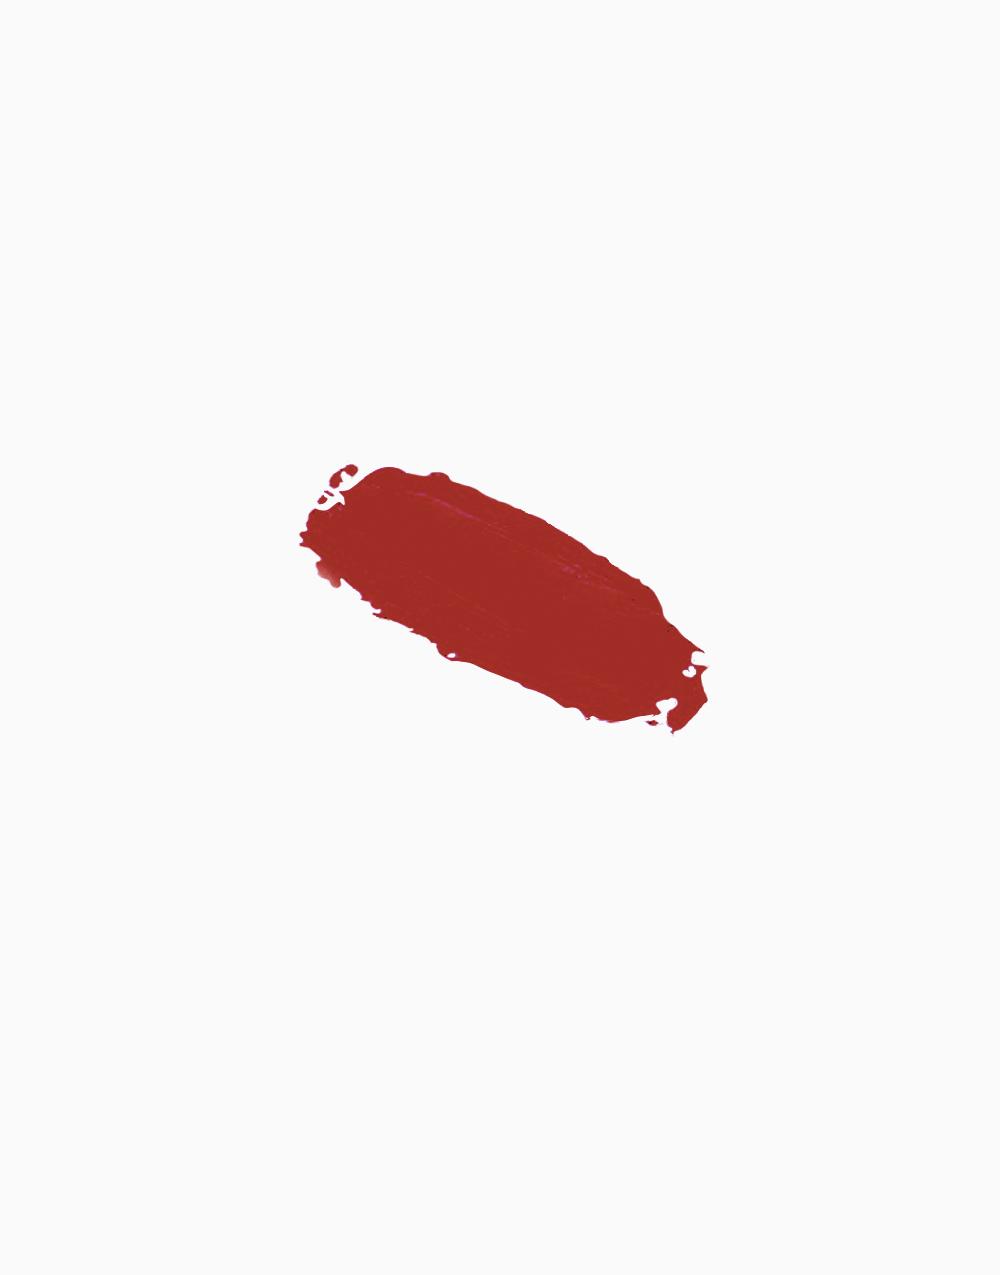 Pocket Blush by Skin Foundry | Punch Drunk